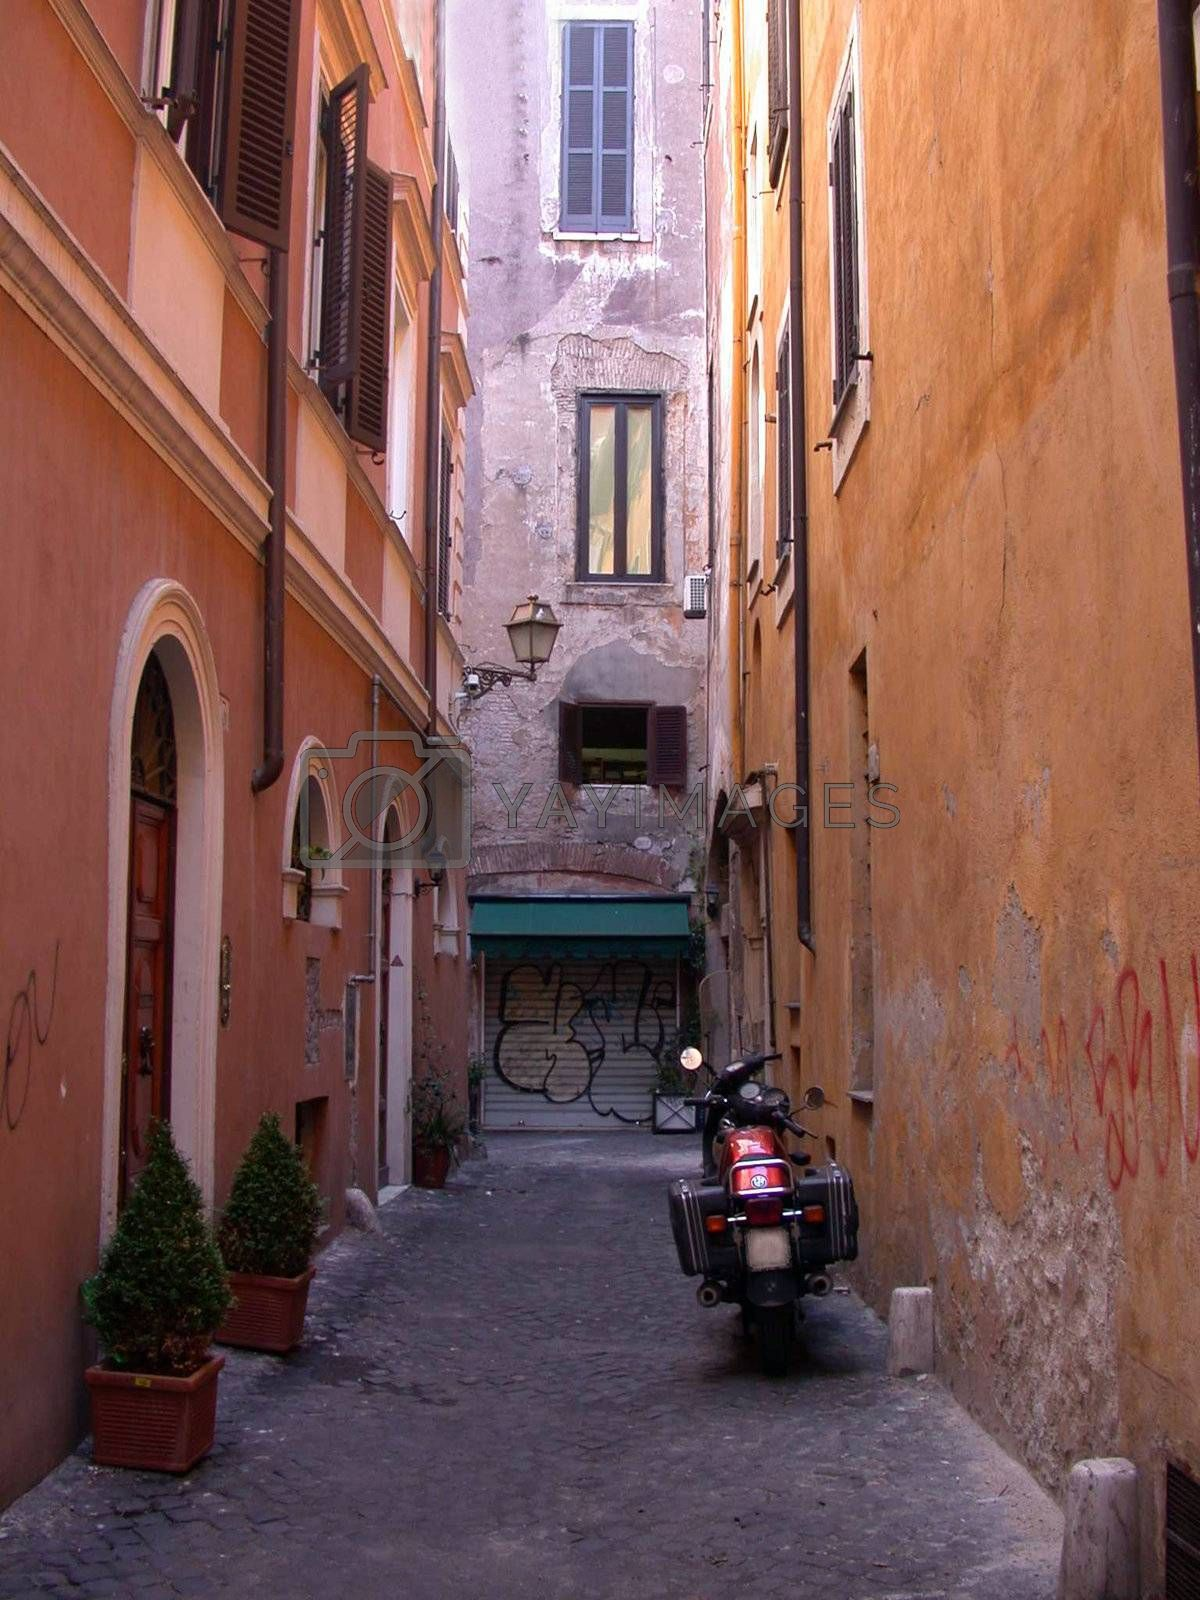 Backyard in rome